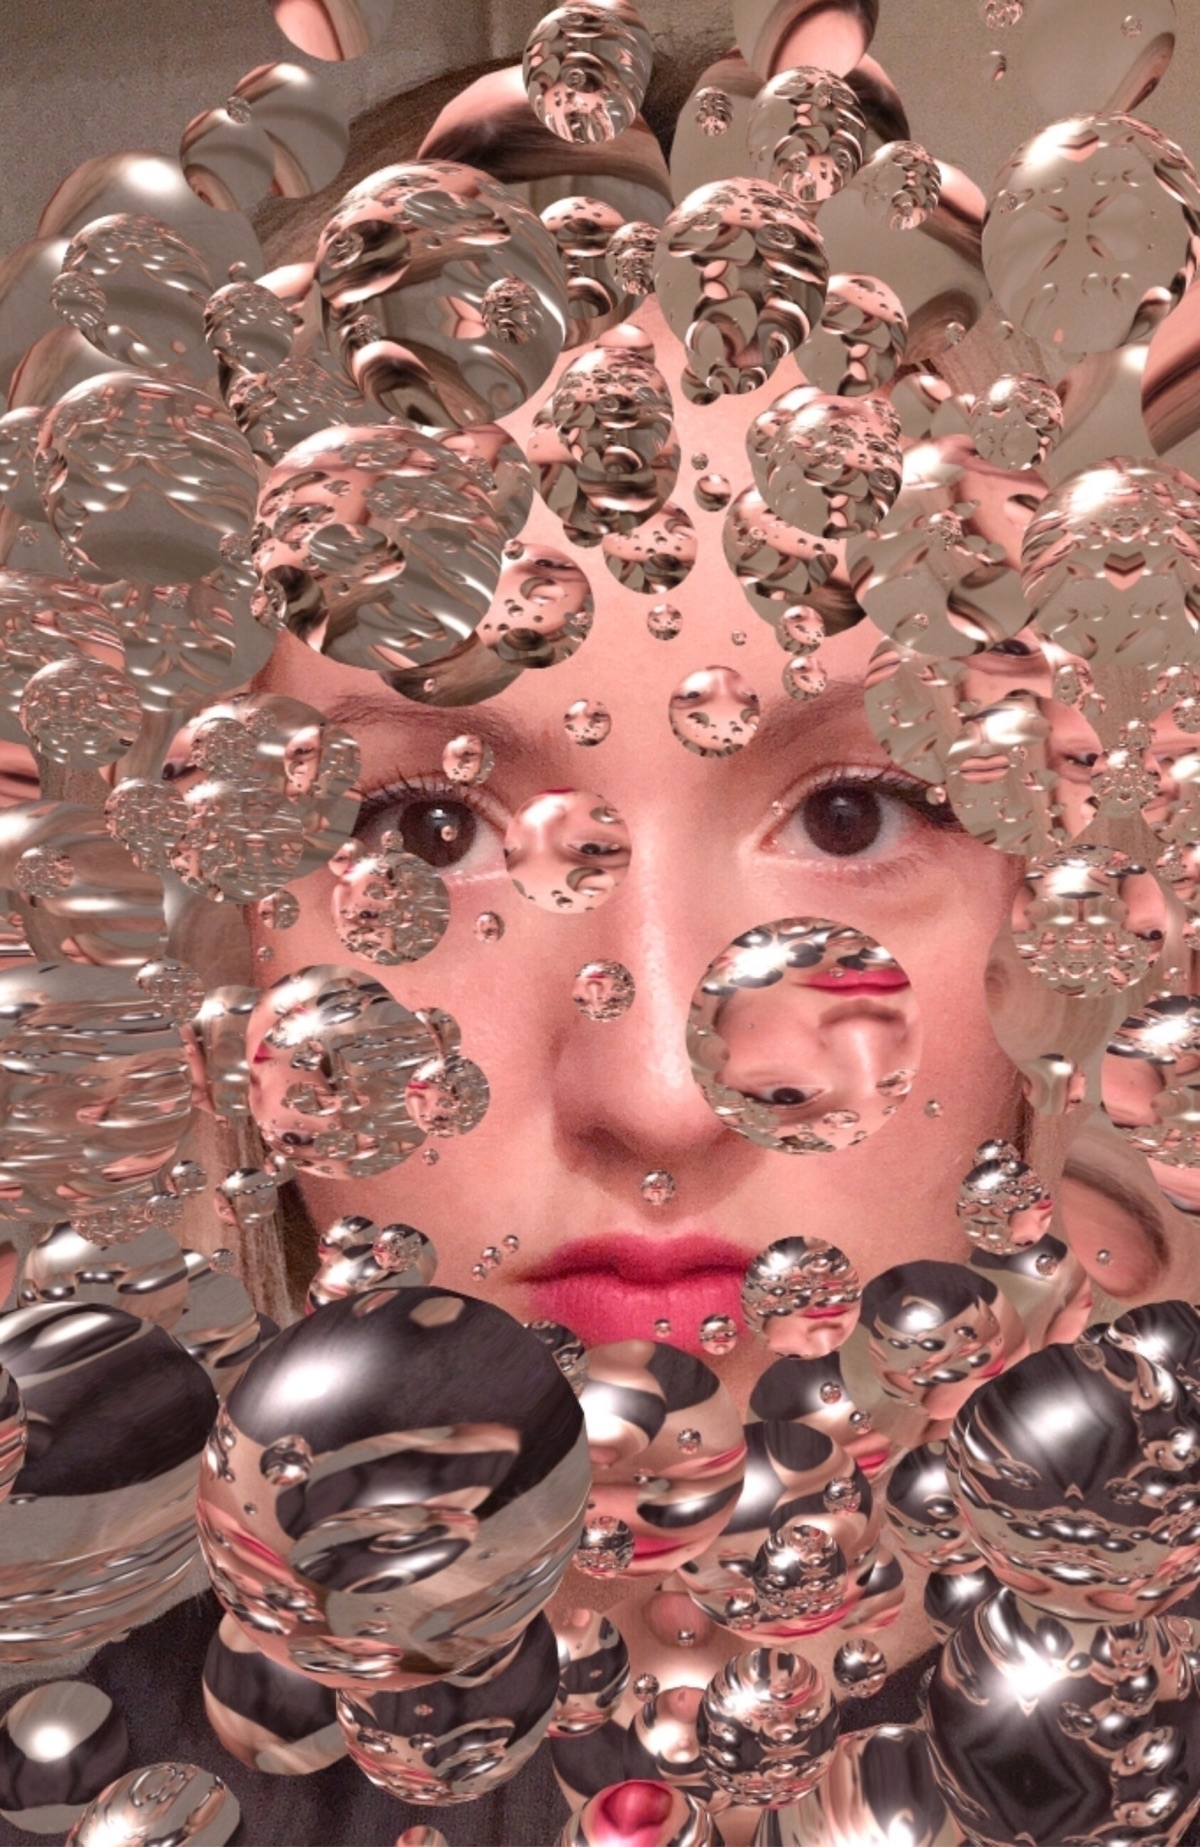 digital, selfie, manipulation - ciocio   ello